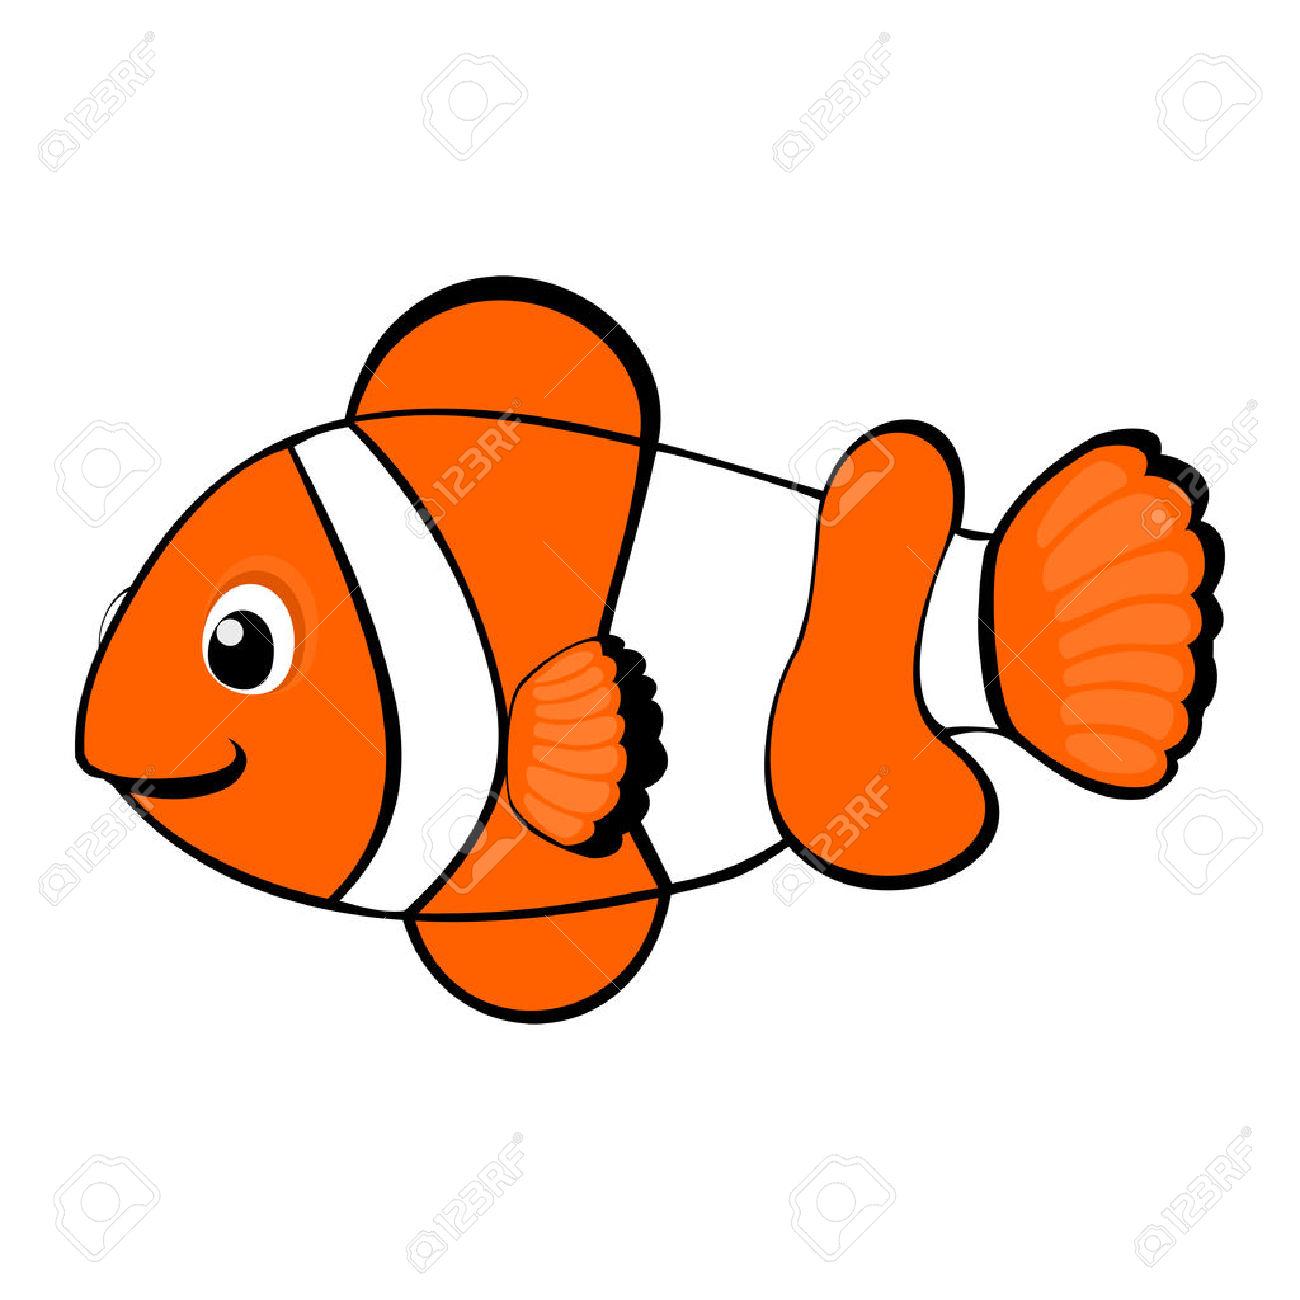 anemone fish clipart clipground clown fish cartoon clipart clown fish clip art black and white